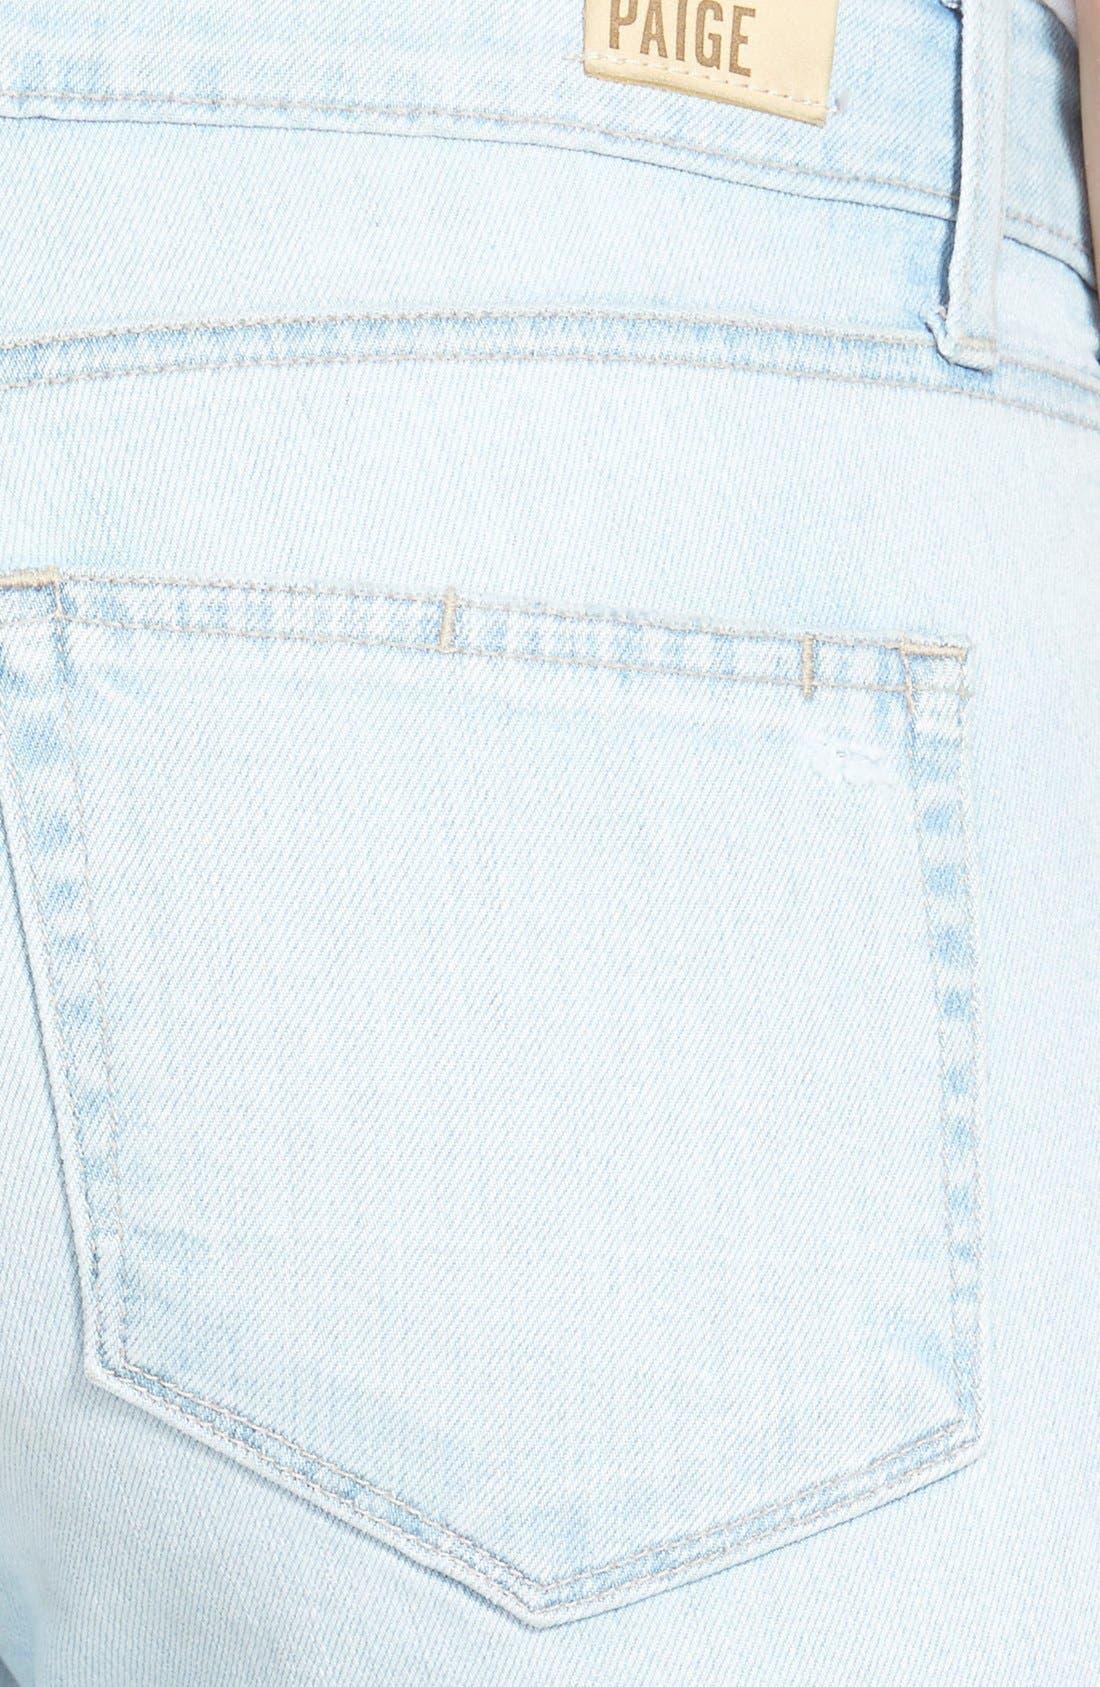 Alternate Image 3  - Paige Denim 'Verdugo' Ultra Skinny Jeans (Cece  Destructed)